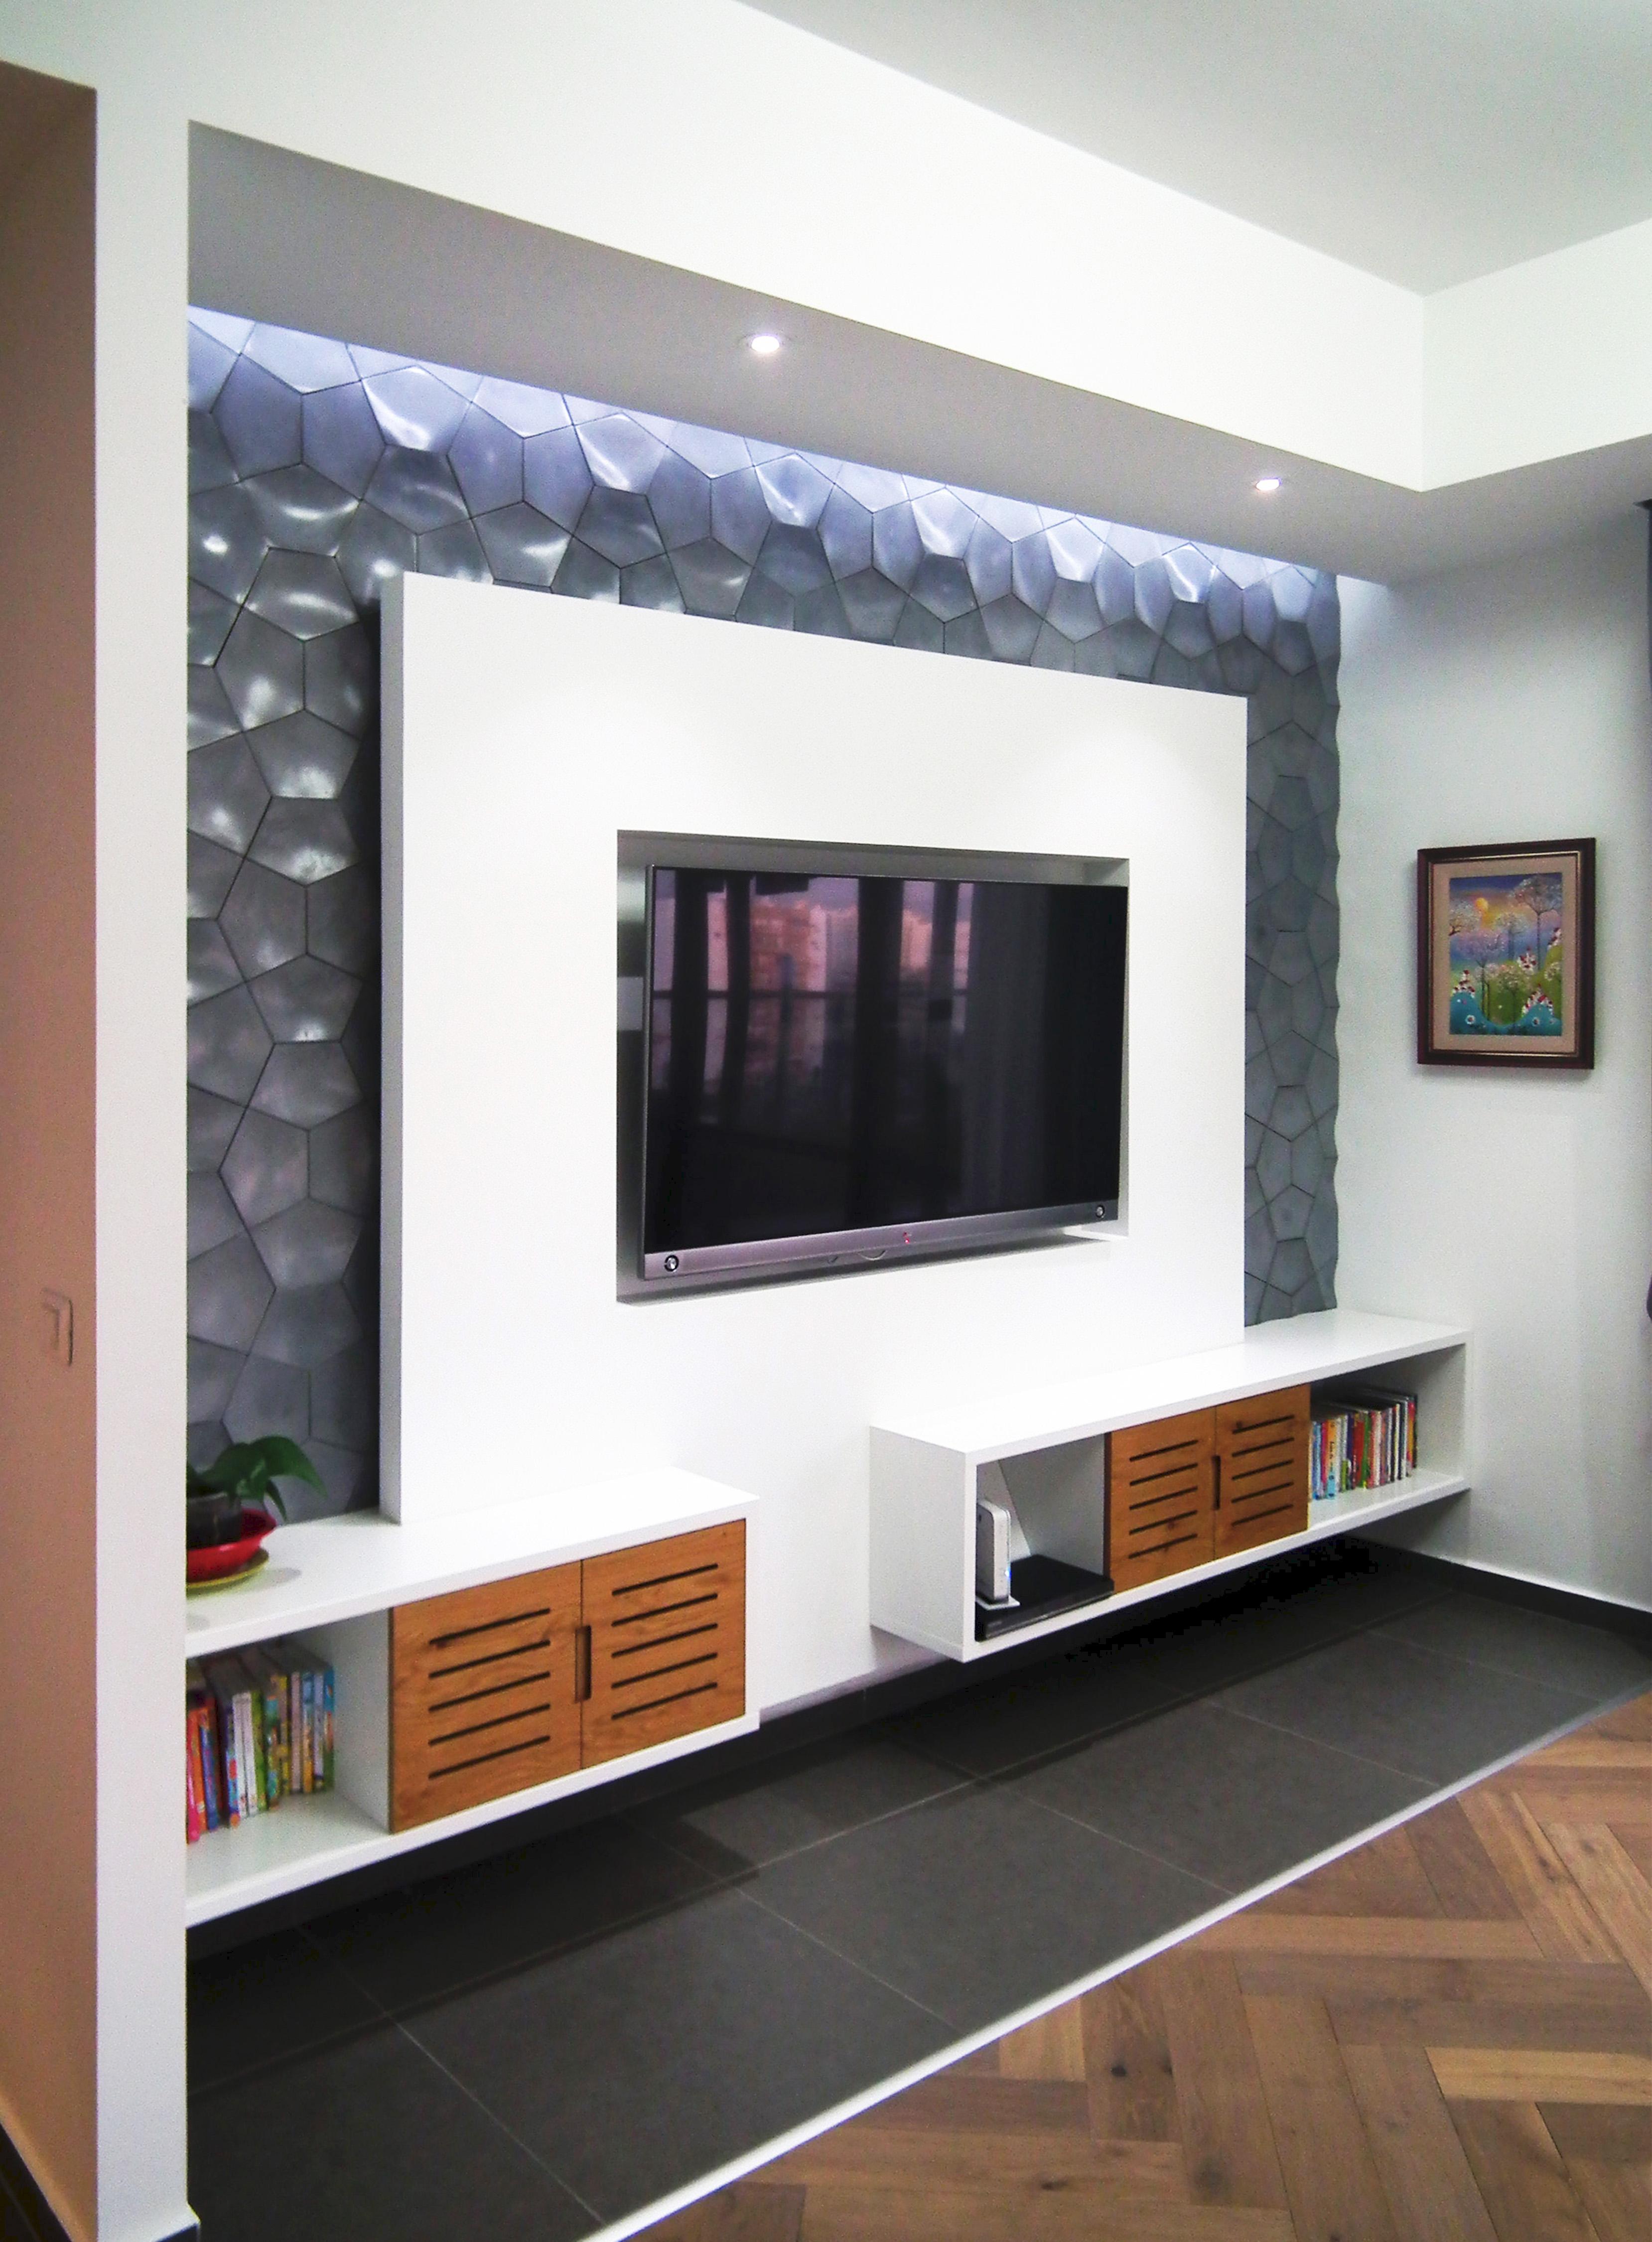 עיצוב בגבס לטלויזיה